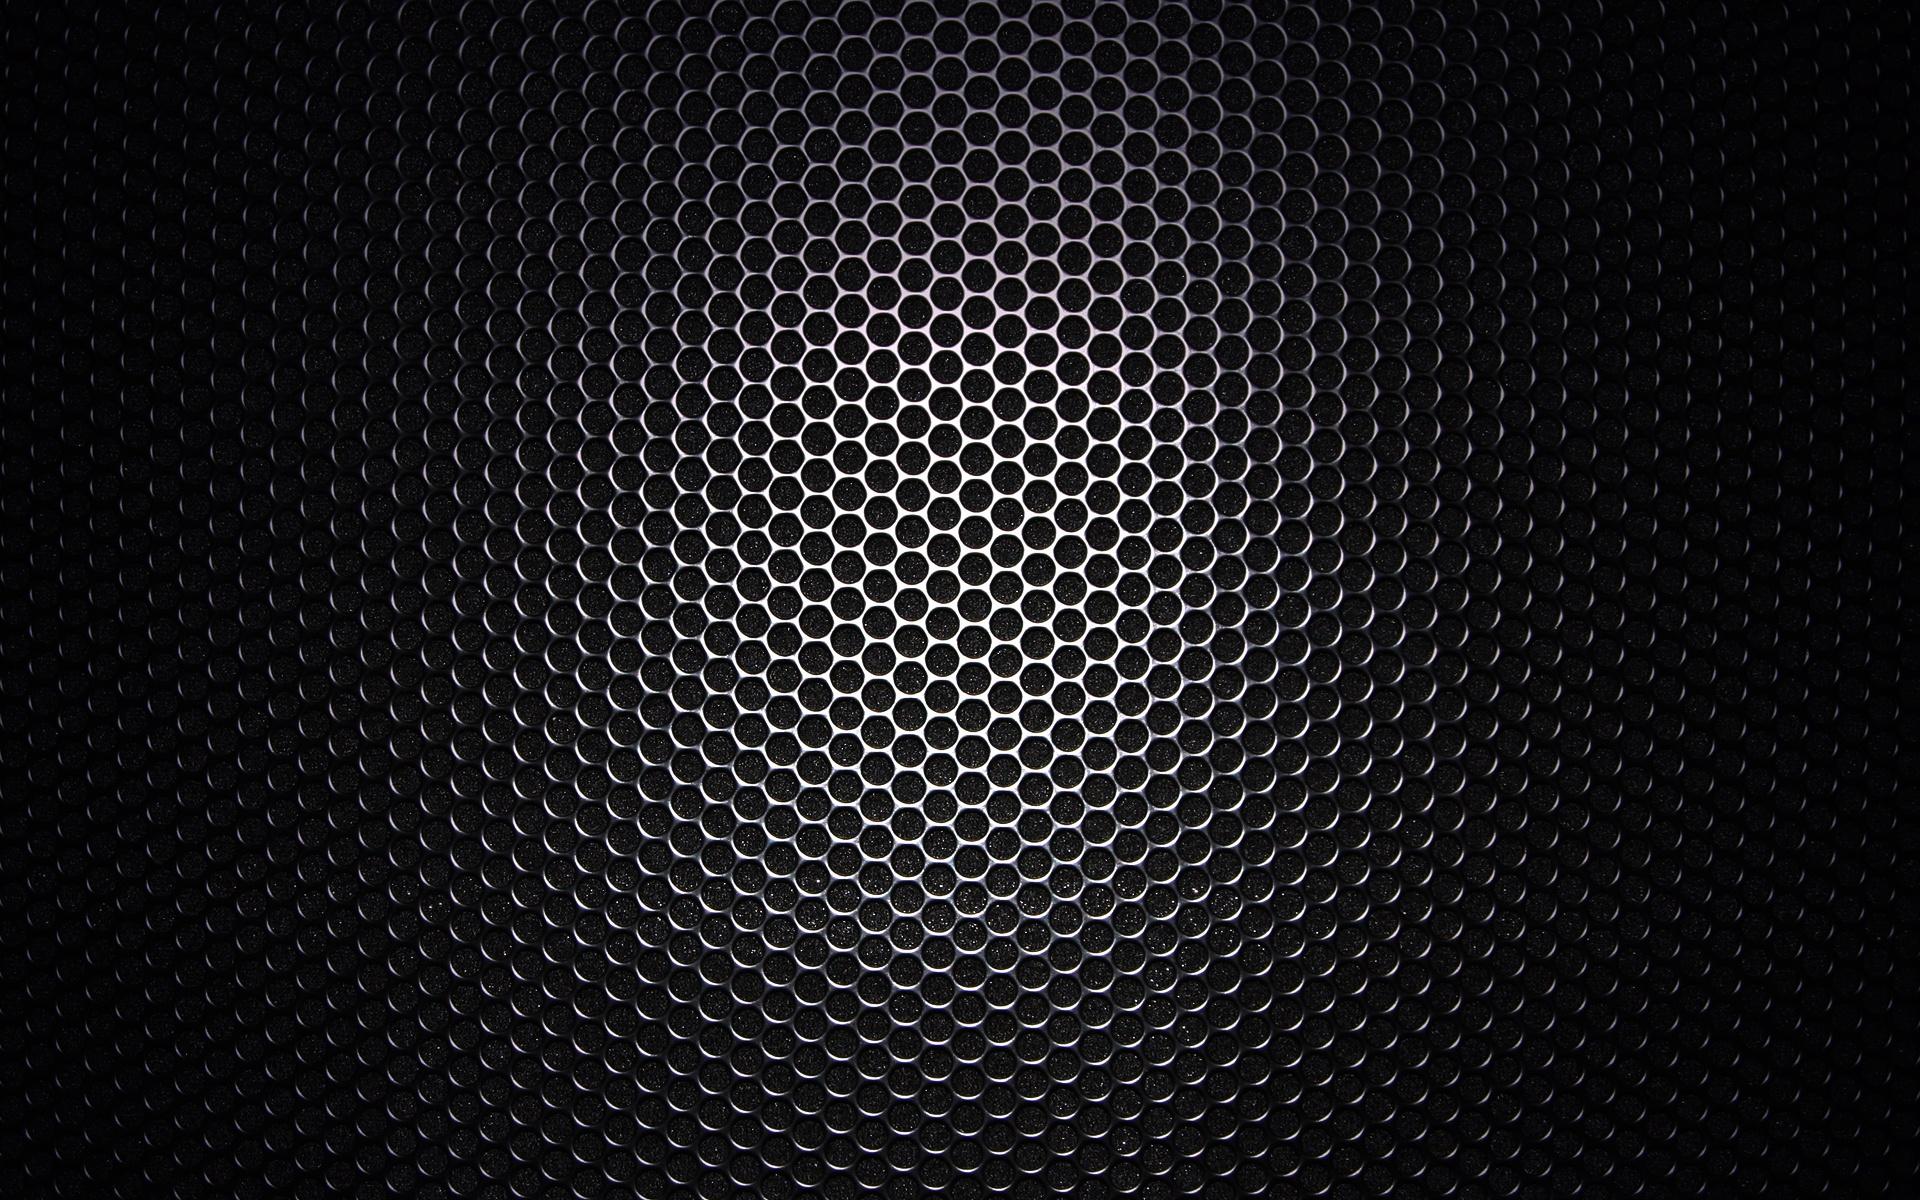 Free Download 1920x1200 Black Honeycomb Pattern Desktop Pc